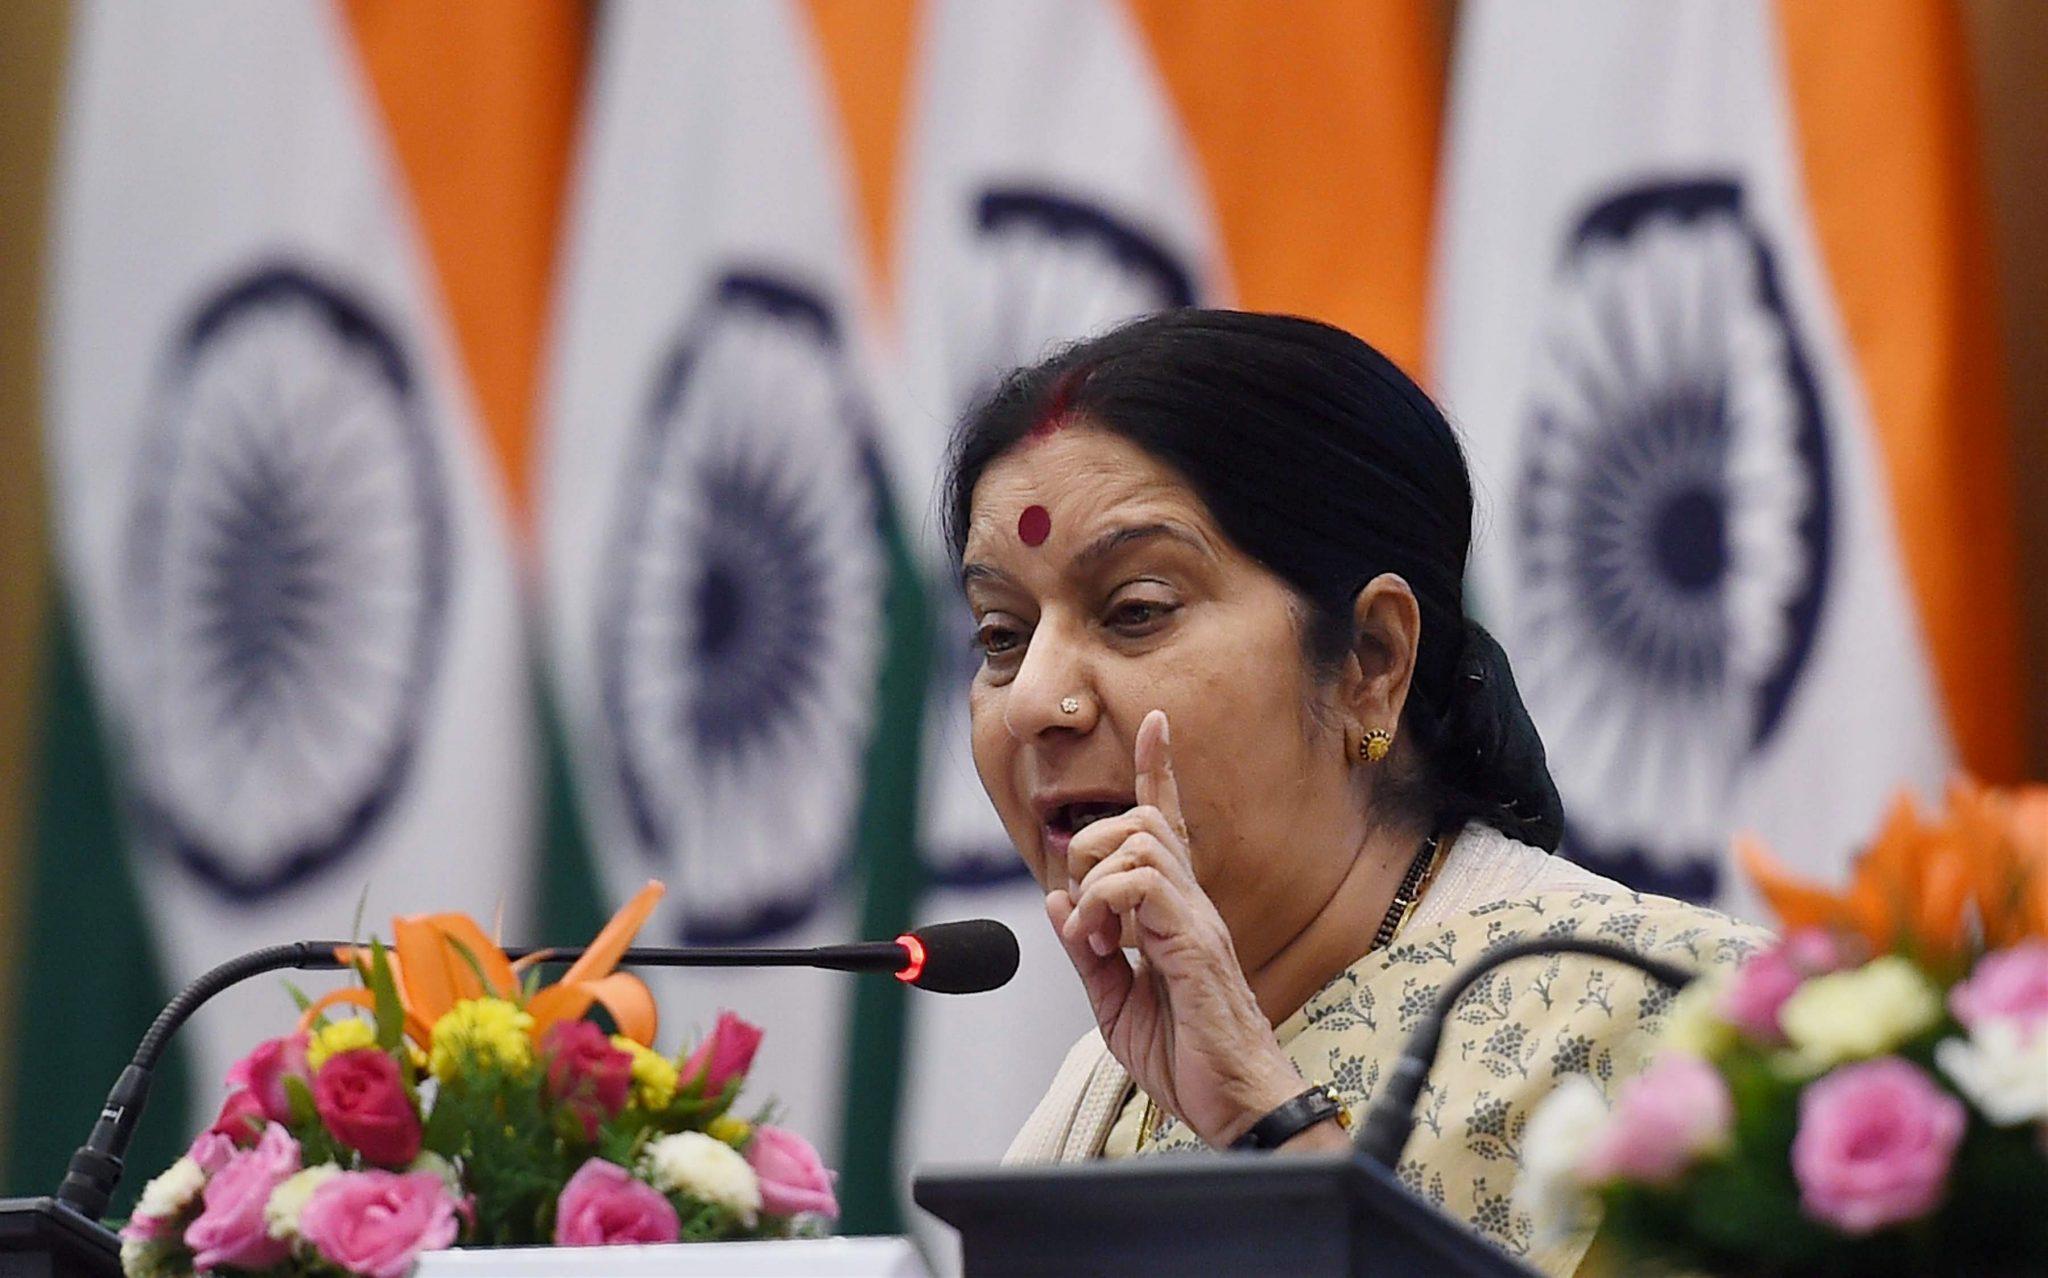 Terror, talks, Pakistan, bilateral, Sushma Swaraj, Minister of External Affairs, EAM, NewsMobile, Mobile news, India